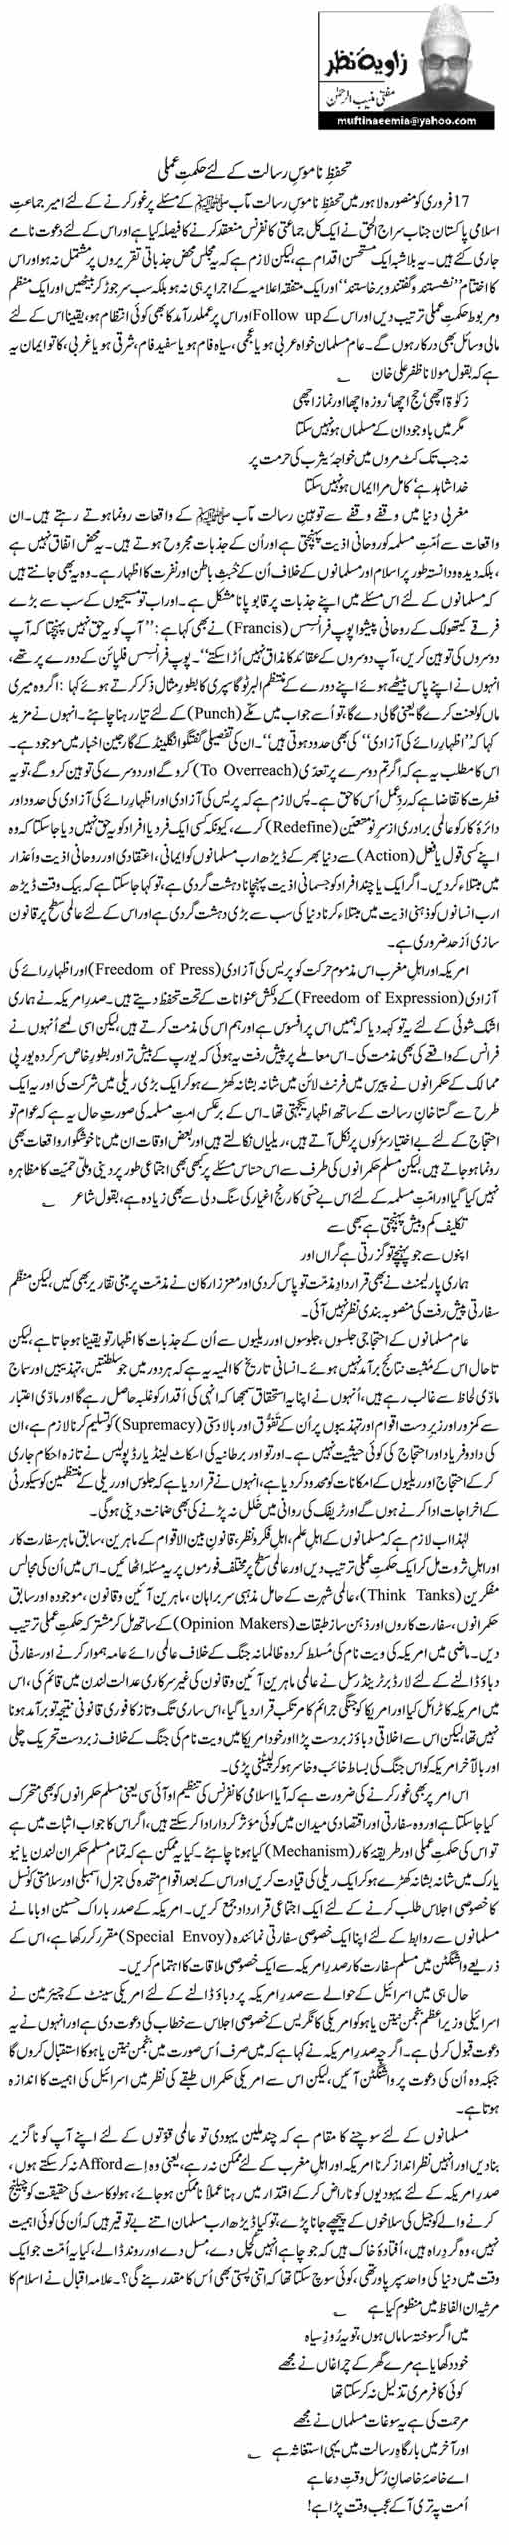 Tahafuz e Namoos e Risalat Kay Leye Hikmat e Amli By Mufti Muneeb - Pakfunny